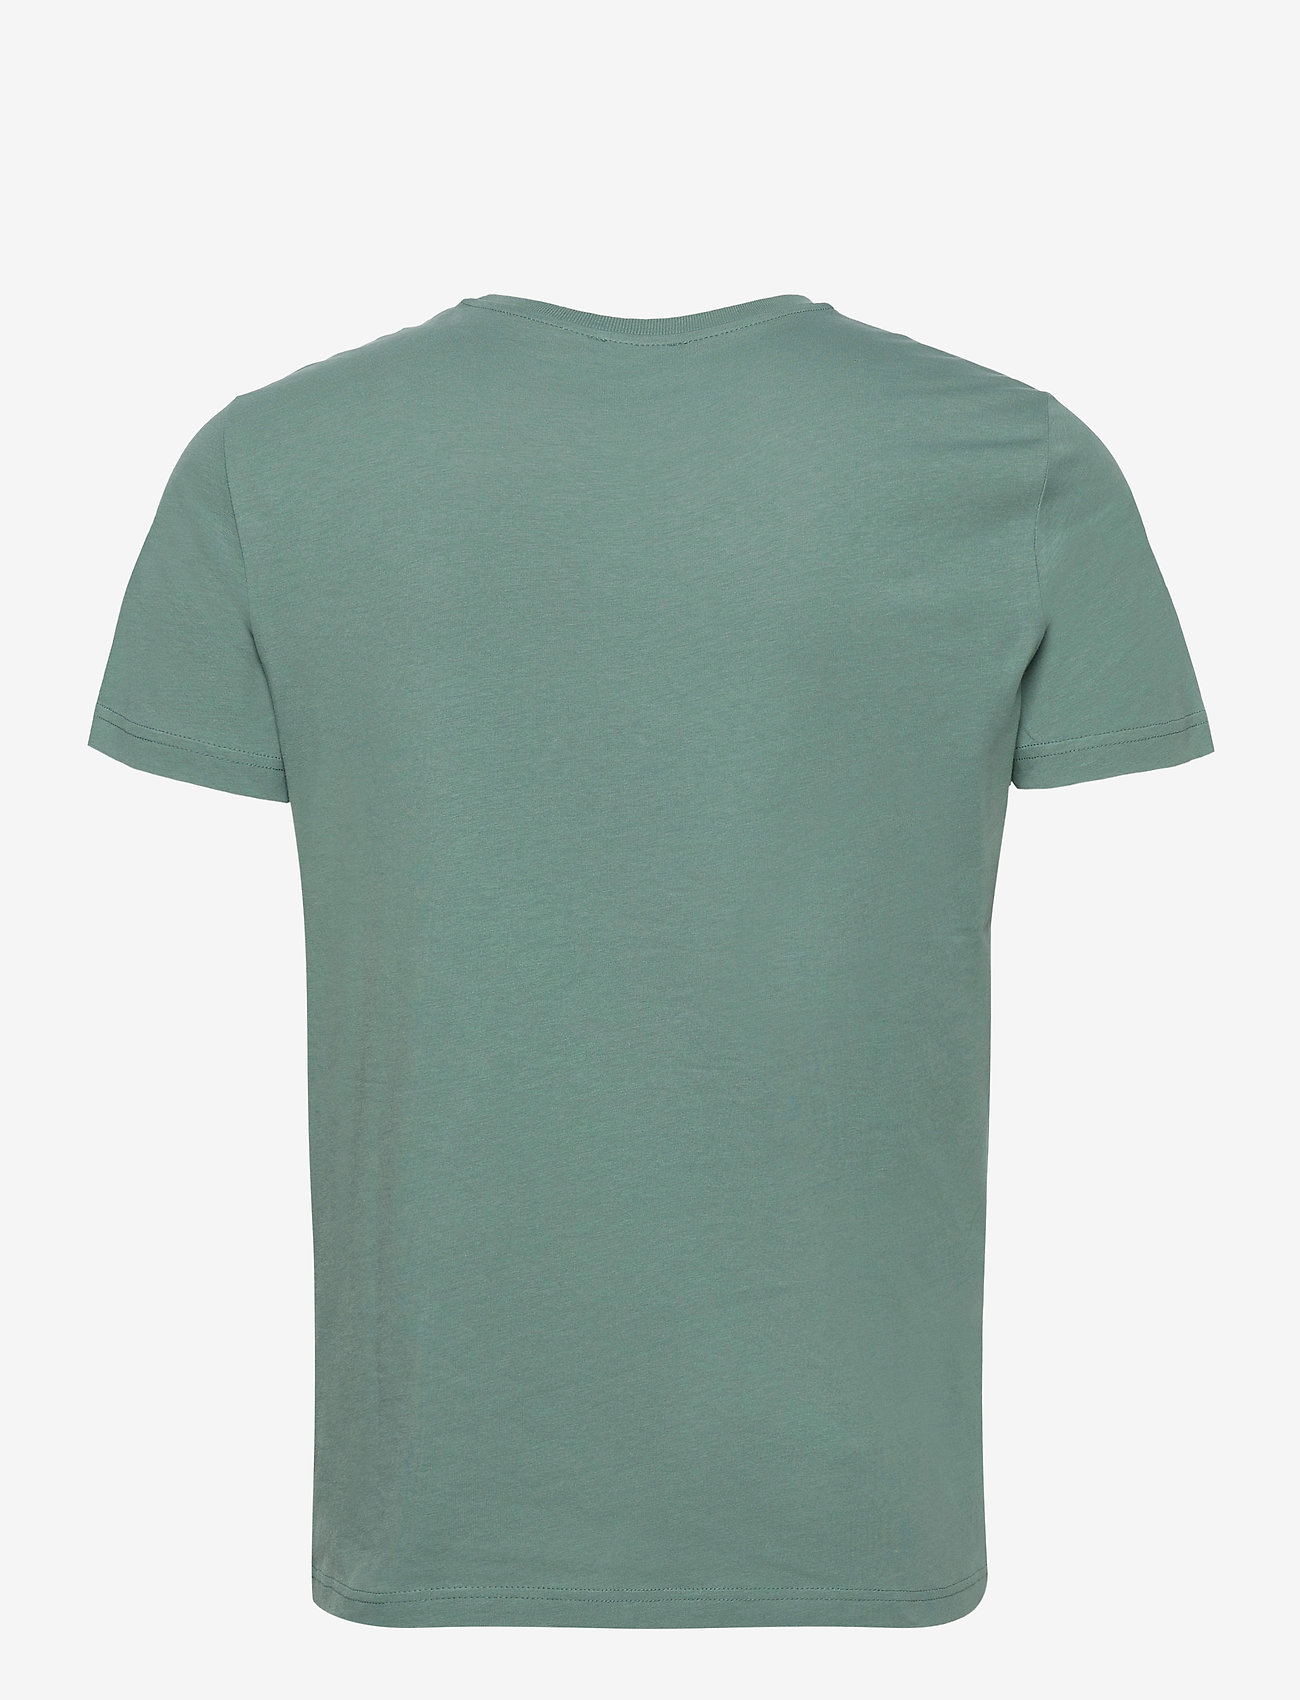 Diesel Men - T-DIEGOS-K30 T-SHIRT - basic t-shirts - sea pine - 1